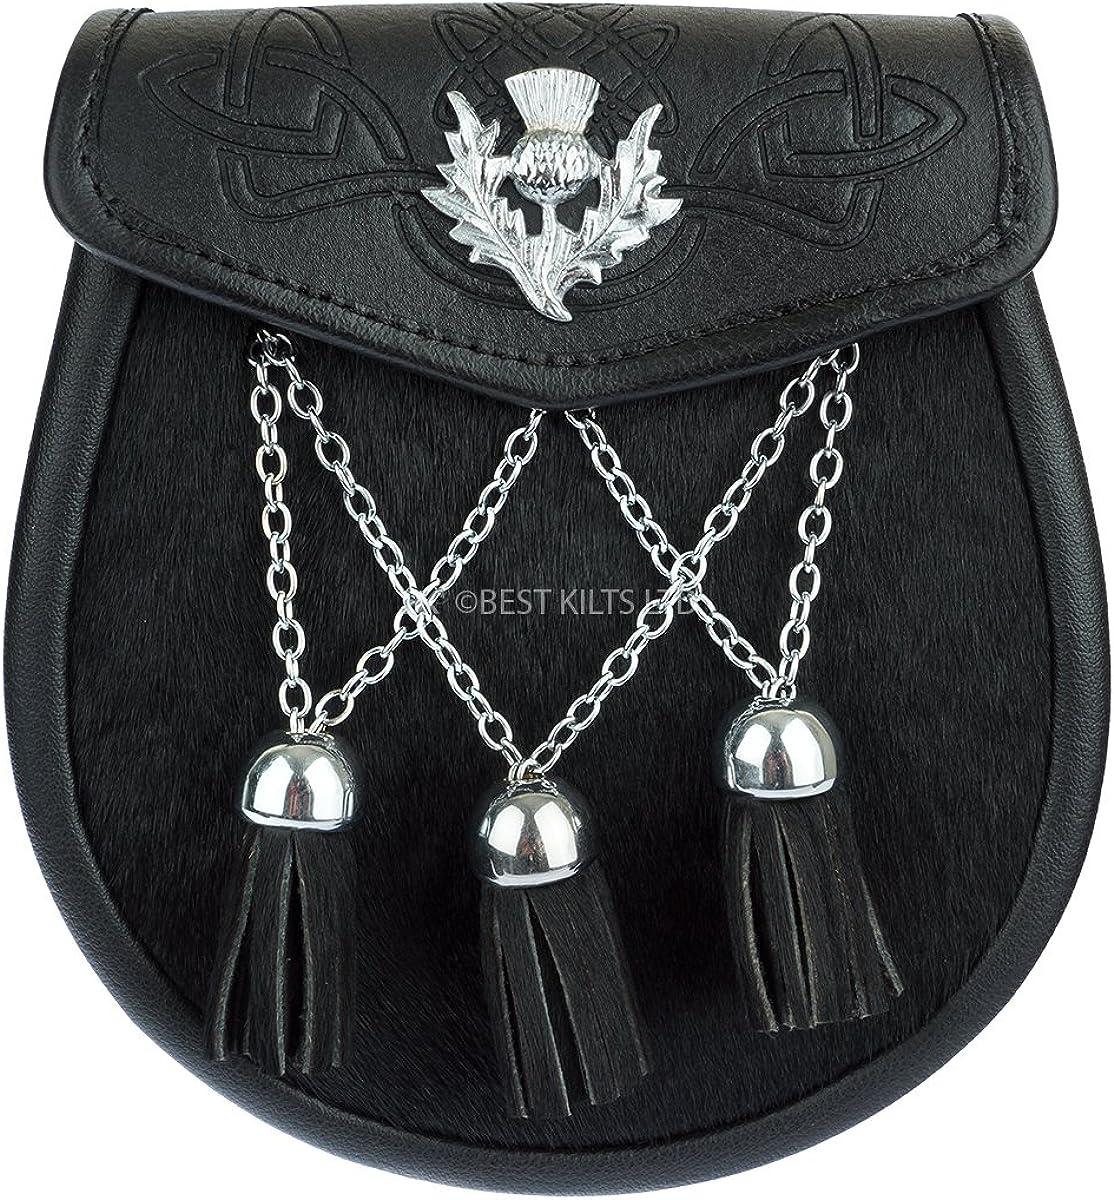 Demi-robe Sporran Noir Embossed Leather /& Black Cowhide Thistle Emblem